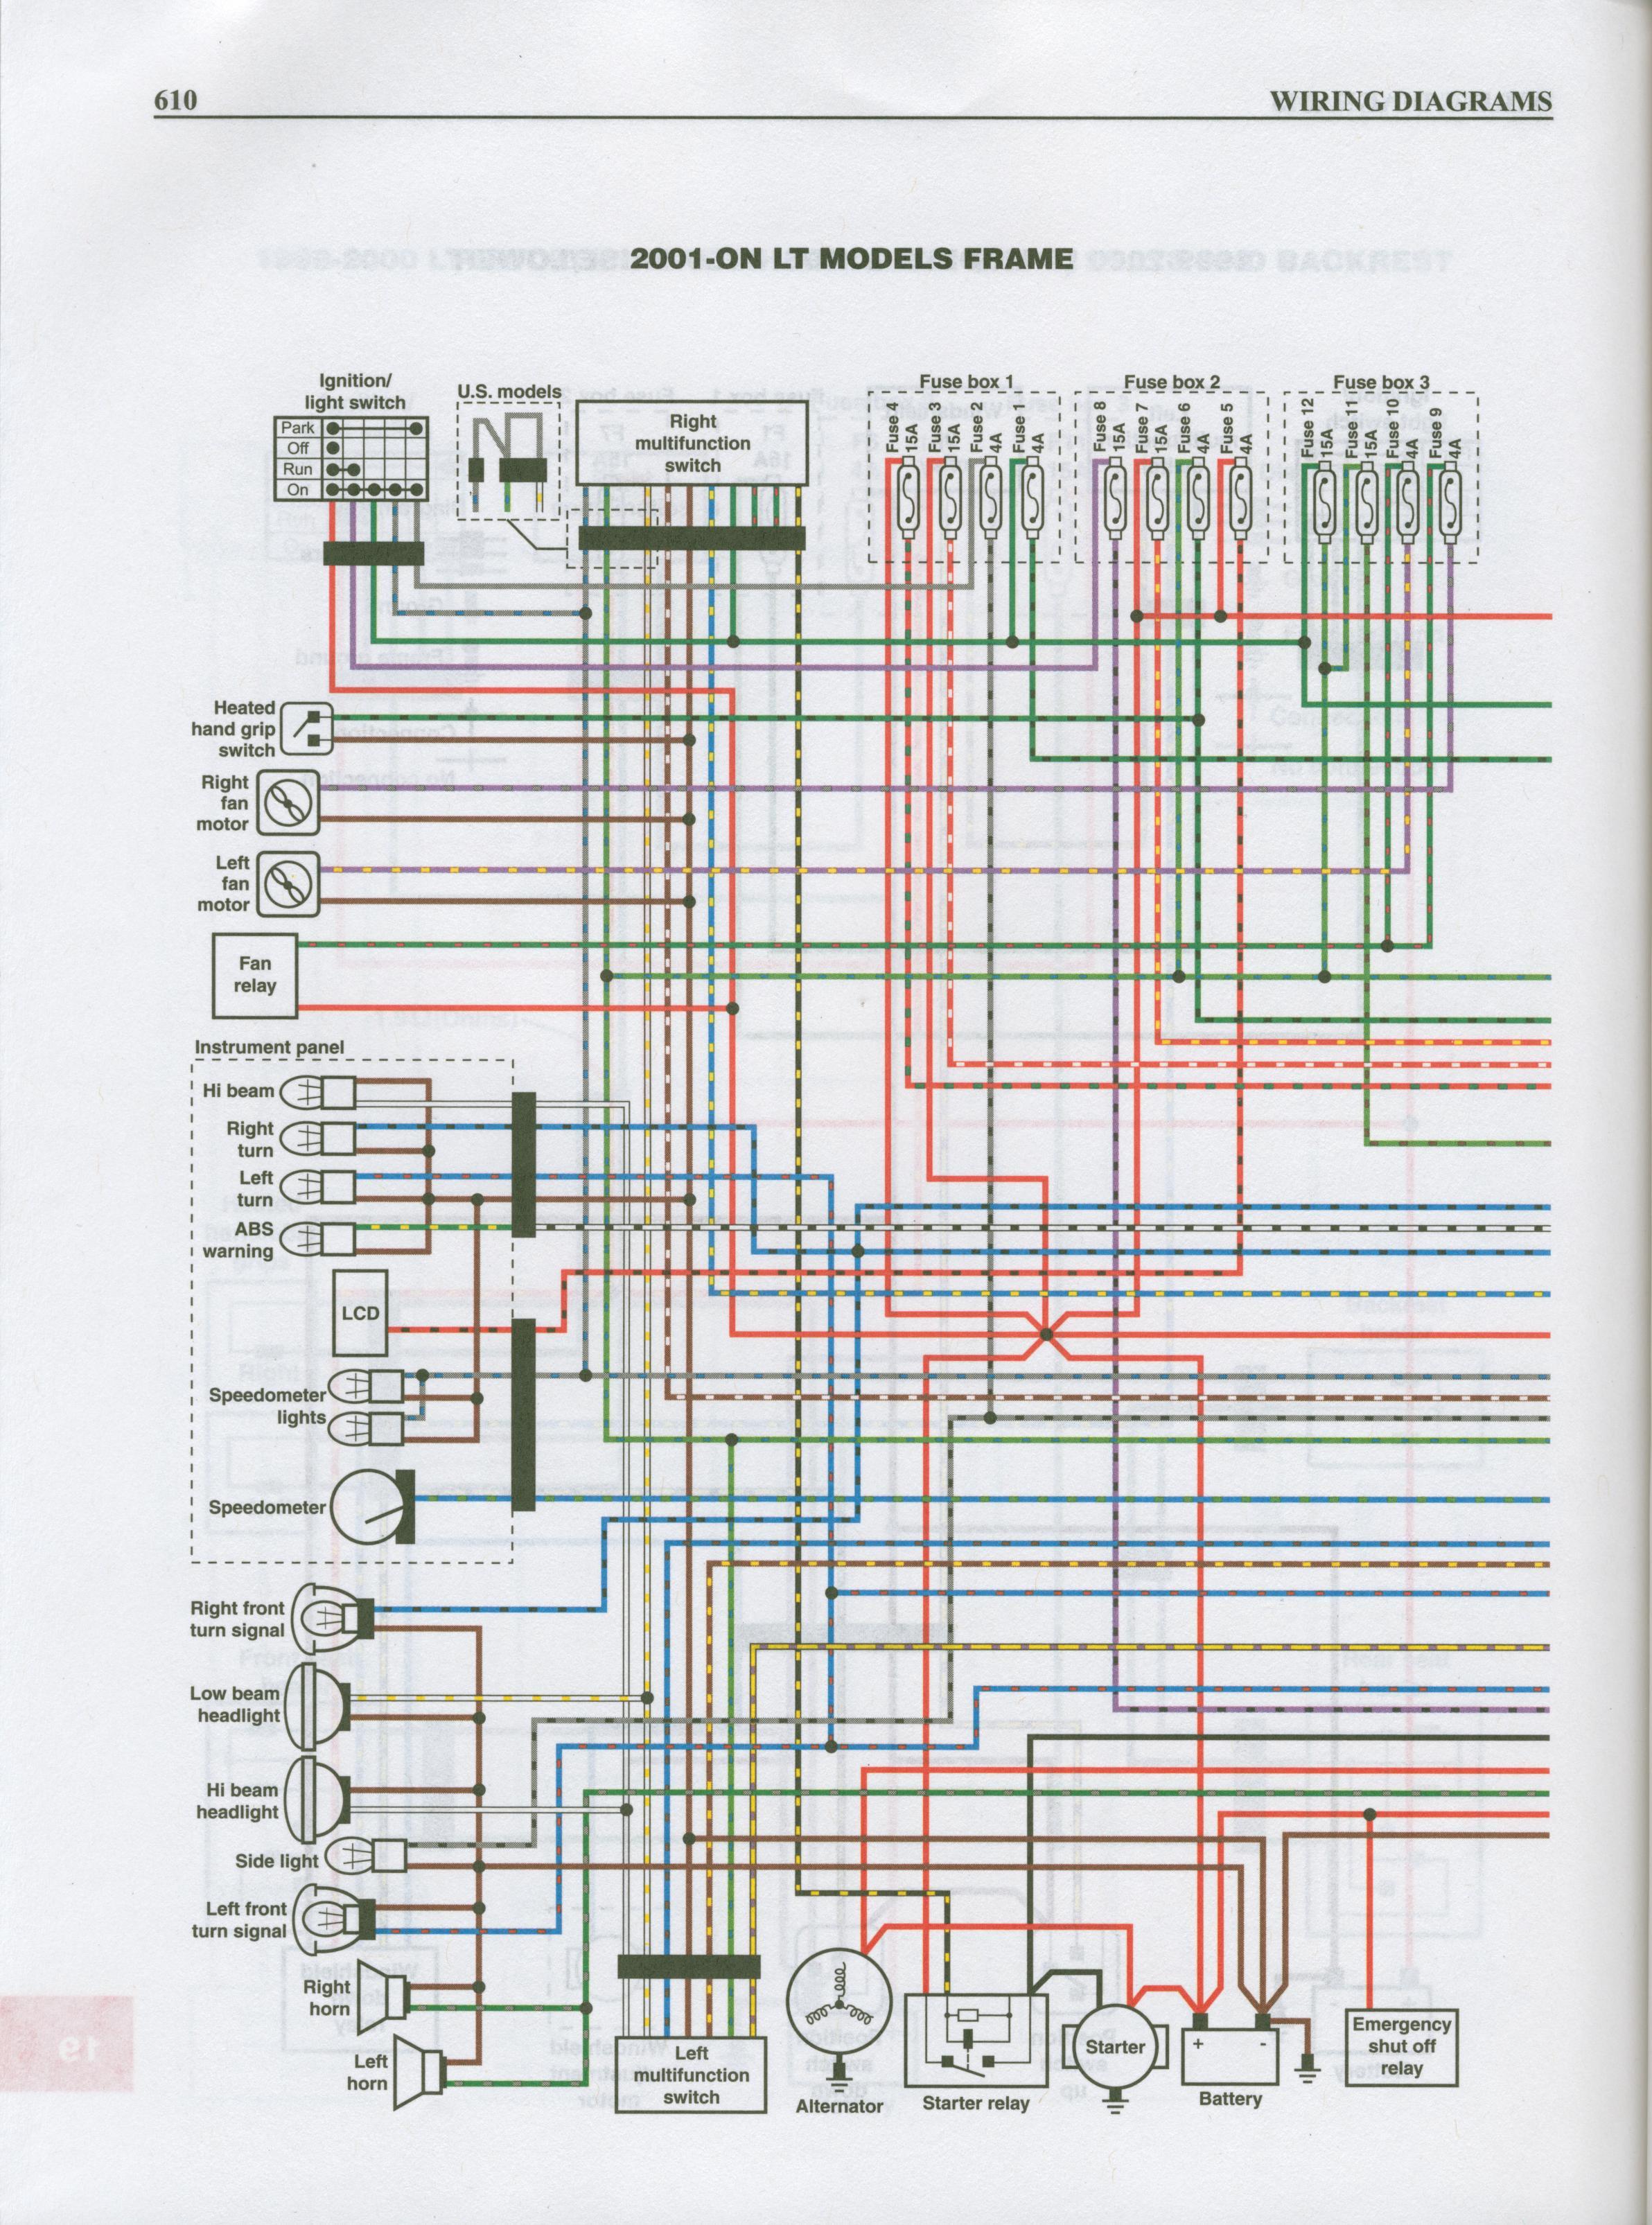 bmw k1200lt electrical wiring diagram - home wiring diagram  home wiring diagram